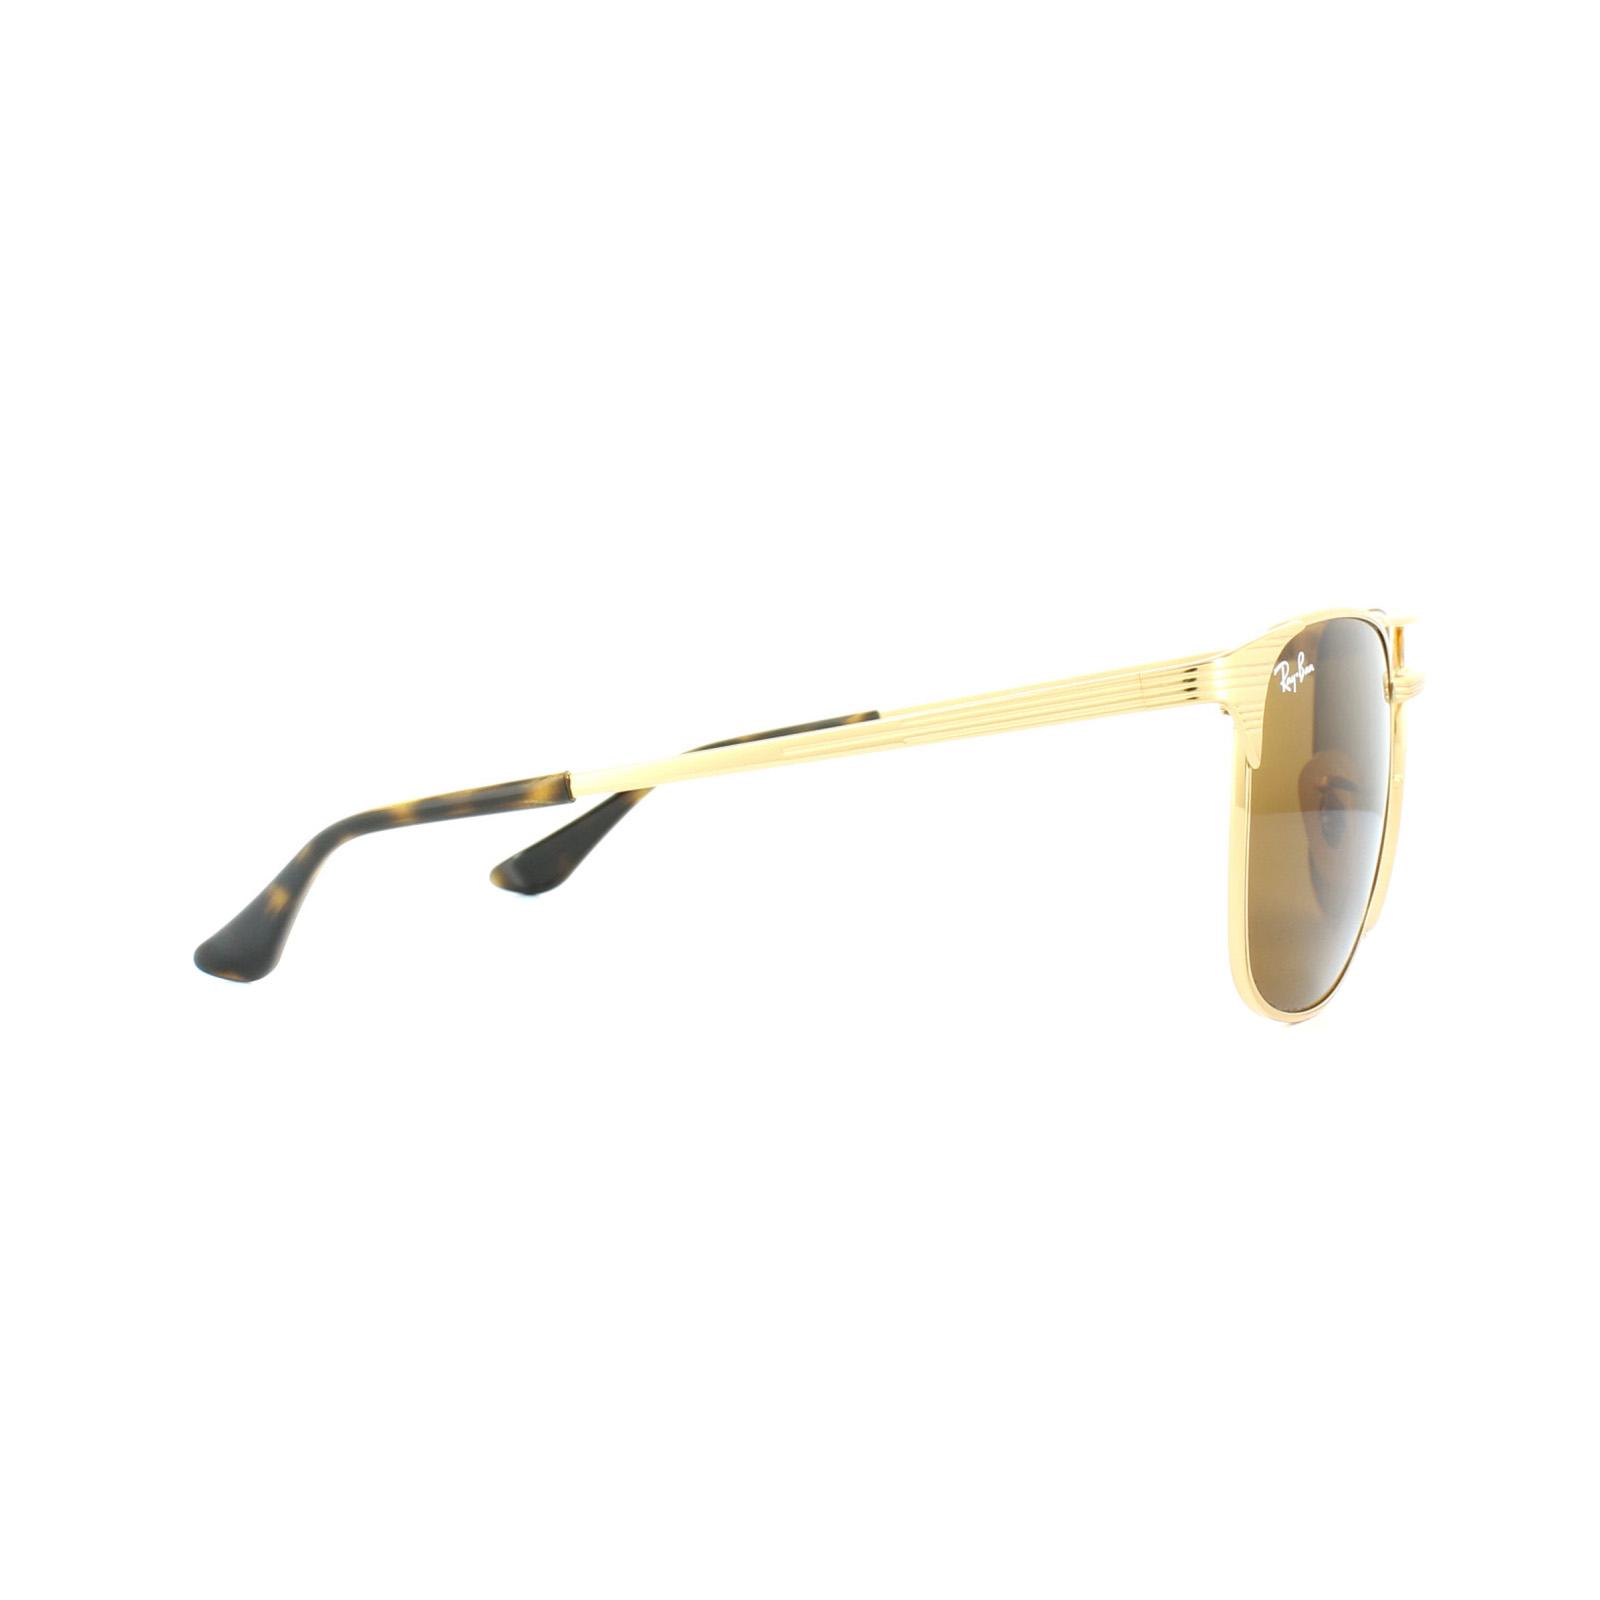 ad9bdac53e Cheap Ray-Ban Signet 3429M Sunglasses - Discounted Sunglasses